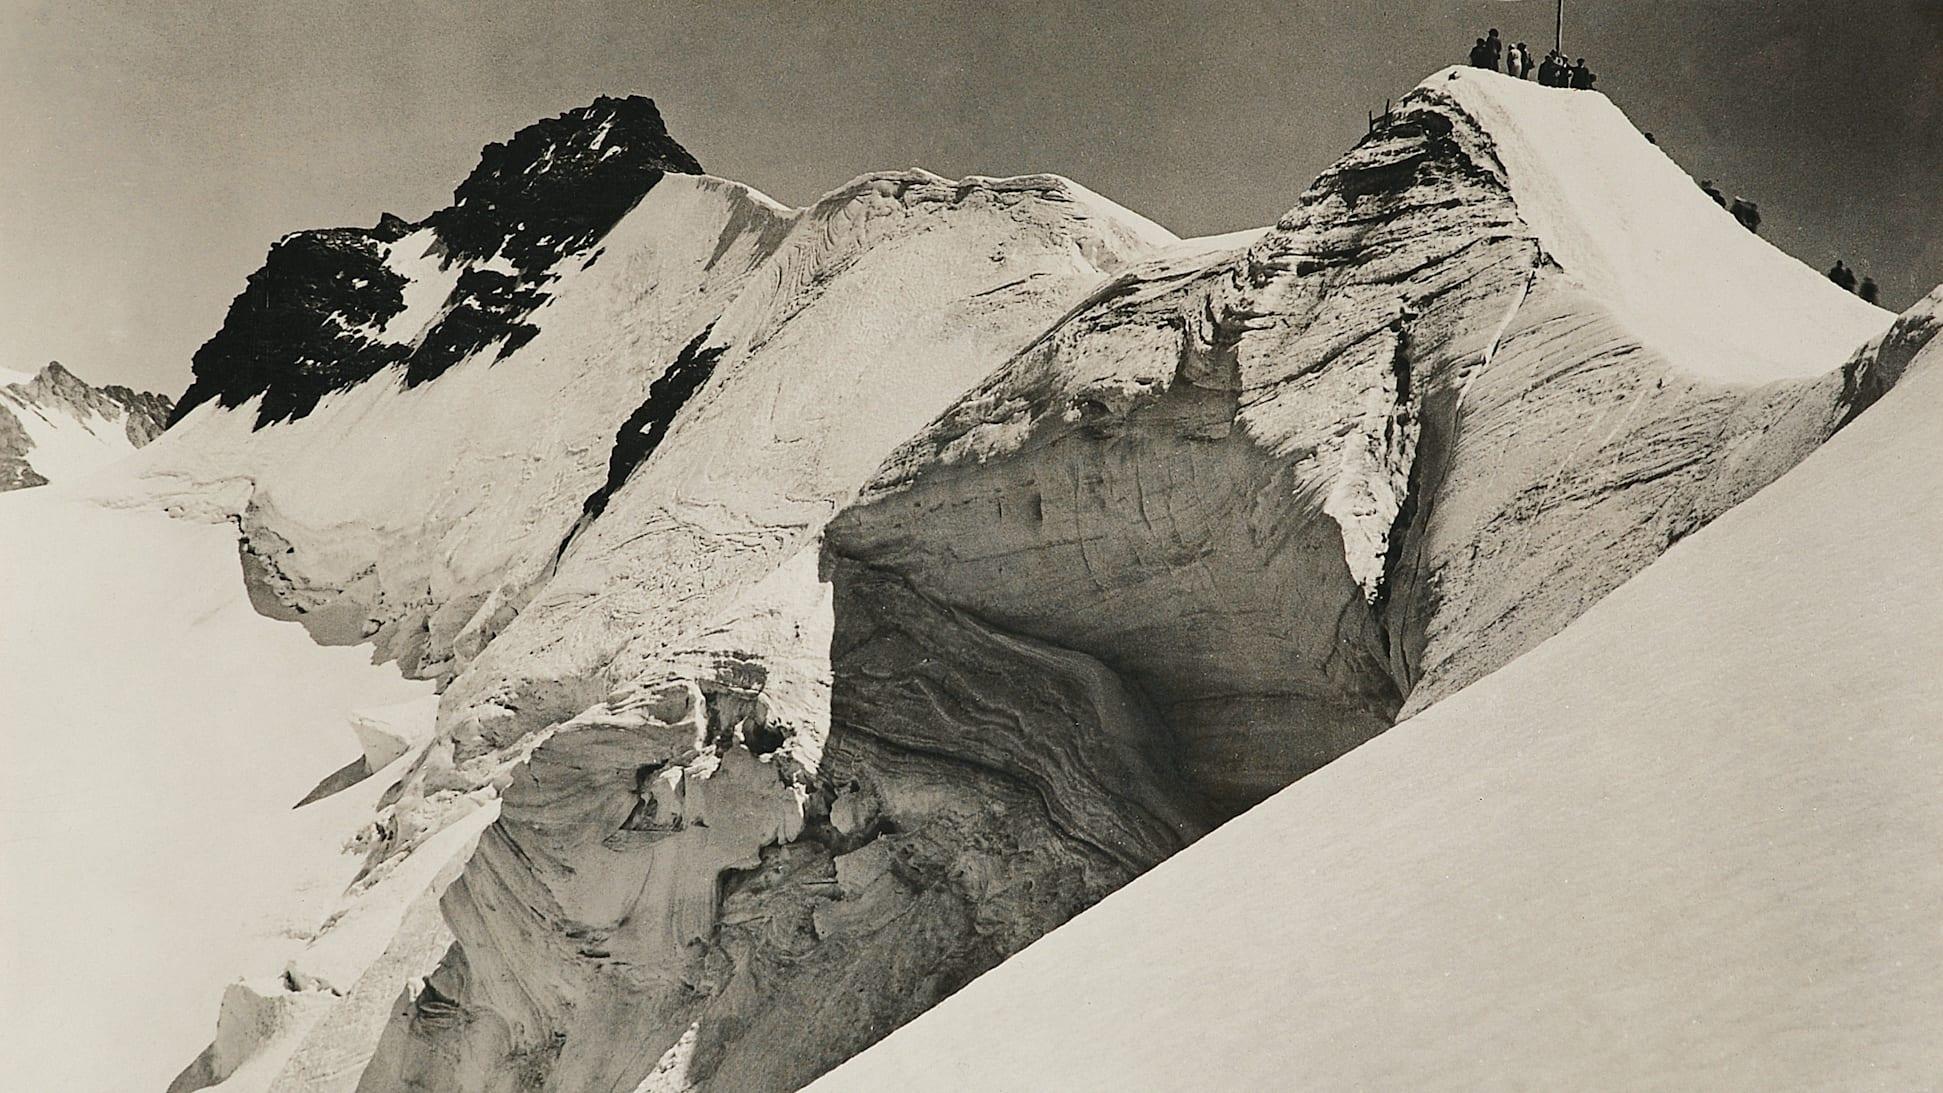 Jungfrau bahn nostalgie jungfraujoch aussichtsplateau